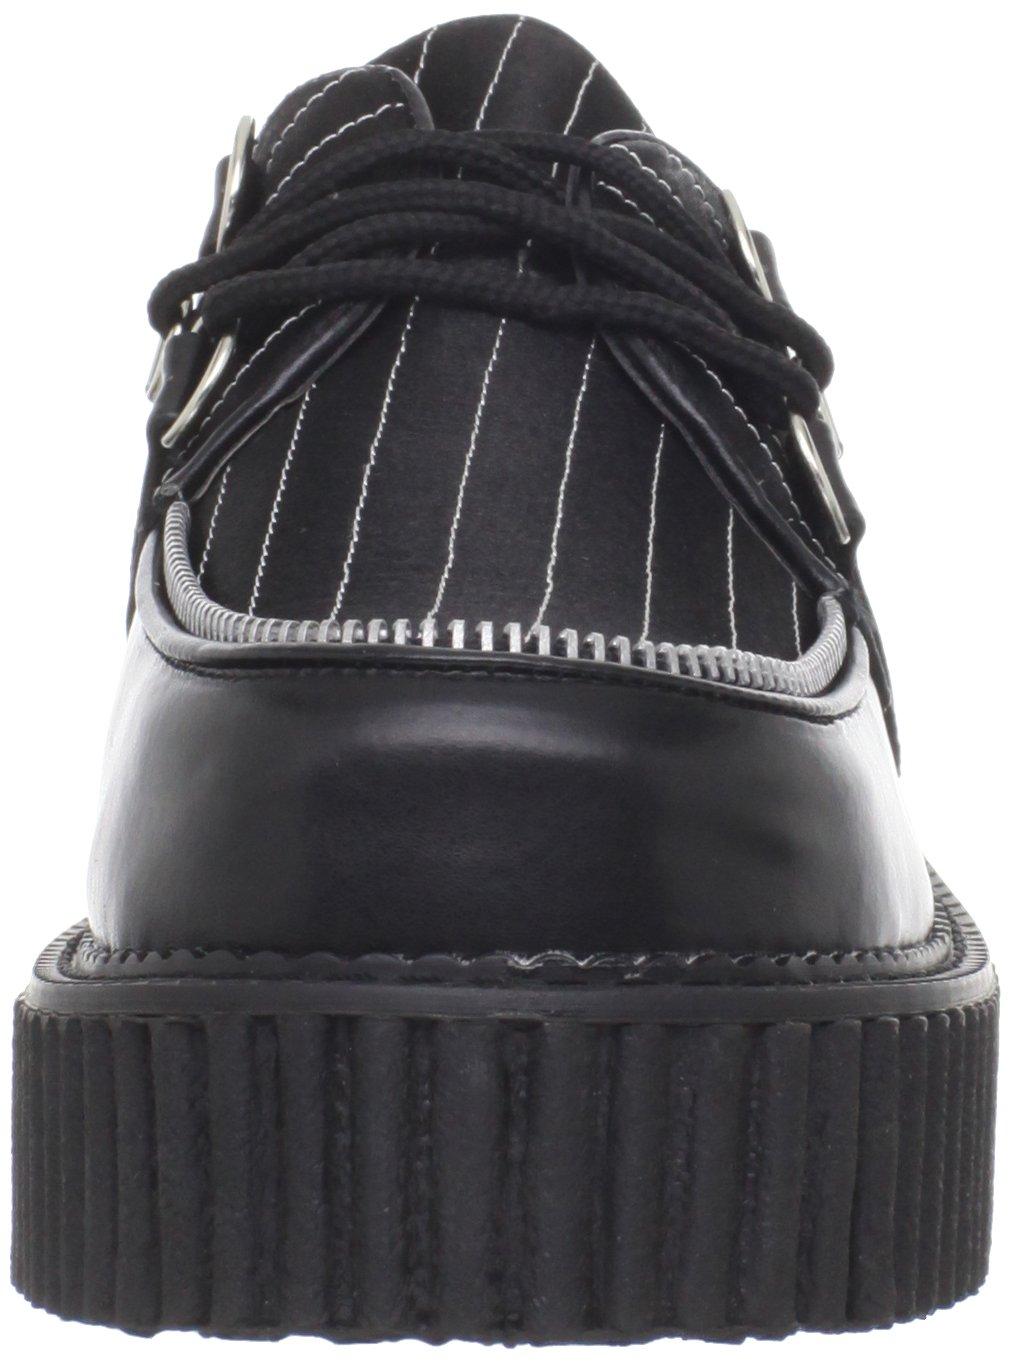 Demonia CREEPER-113 Blk Vegan Leather-Pinstripes UK UK UK 5 (EU 38) 158c98